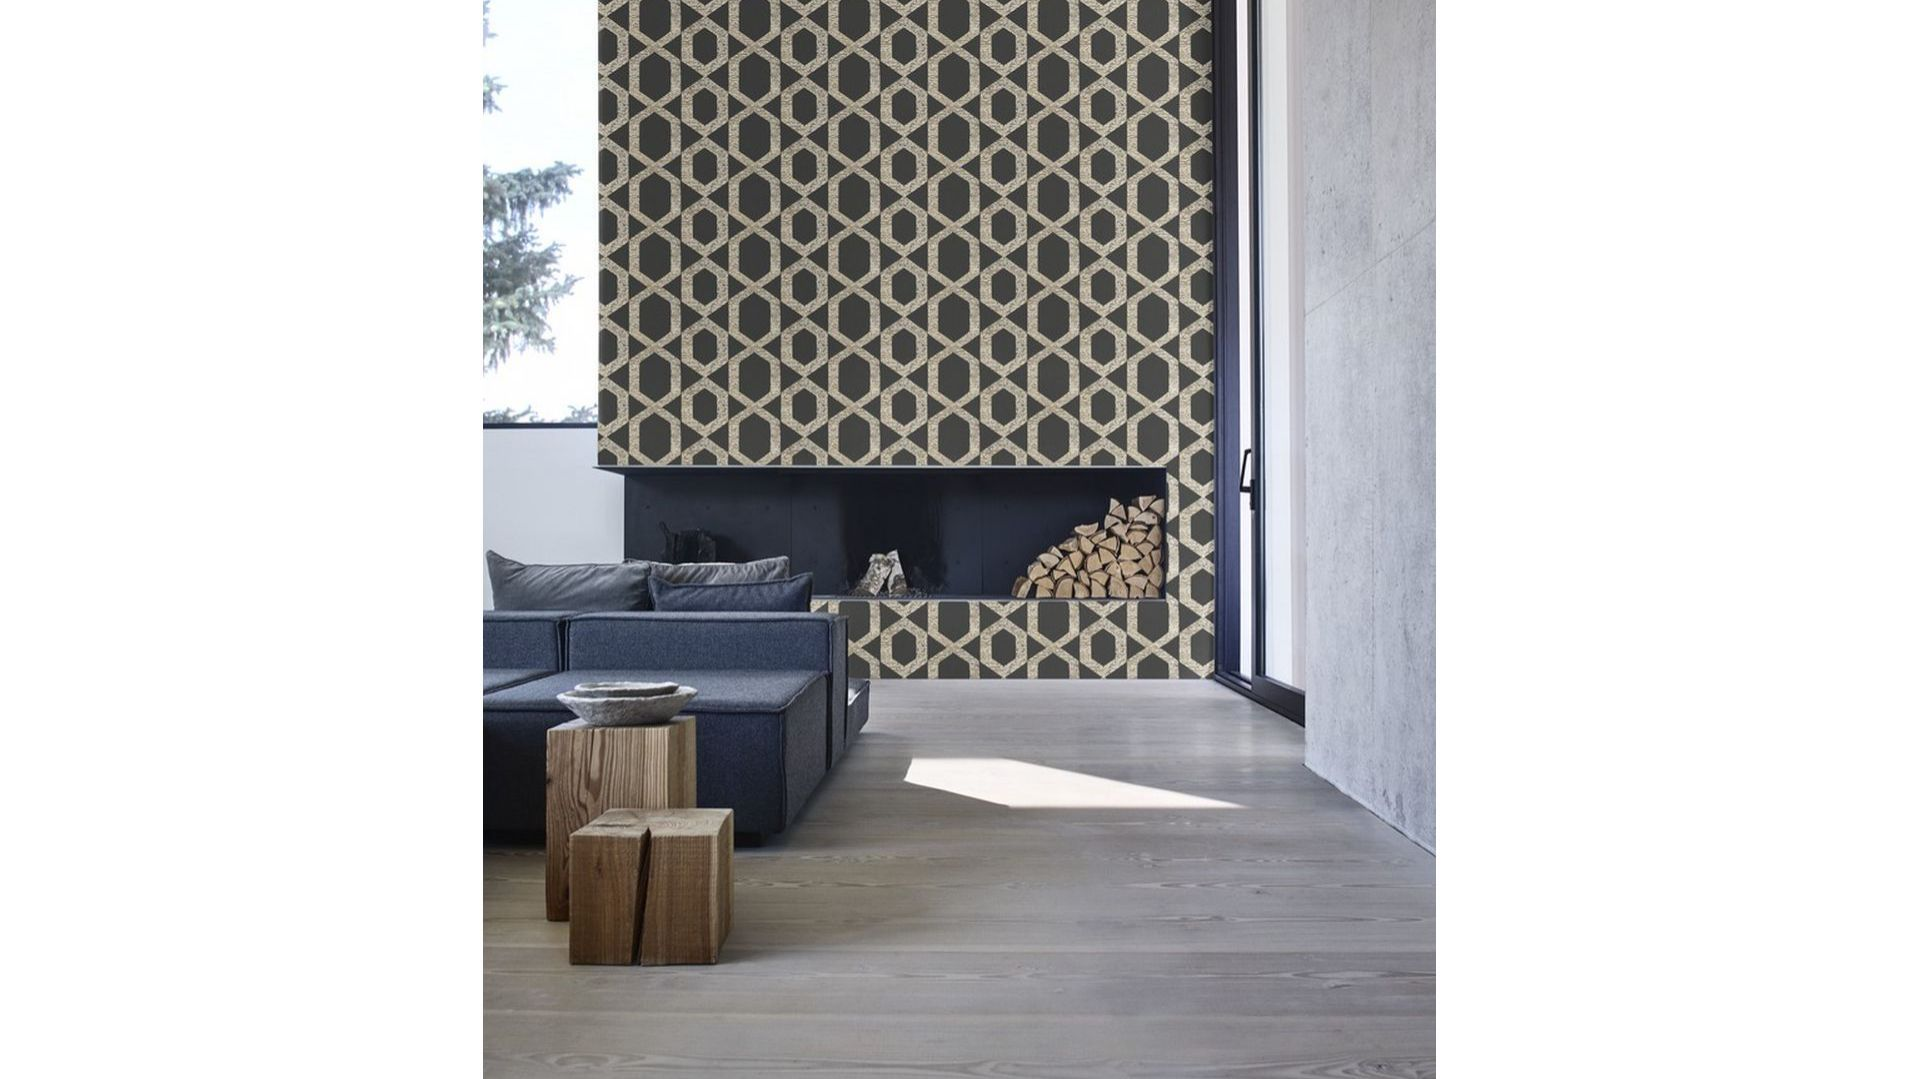 Kolekcja tapet Six Senses/Flügger farby. Produkt zgłoszony do konkursu Dobry Design 2018.